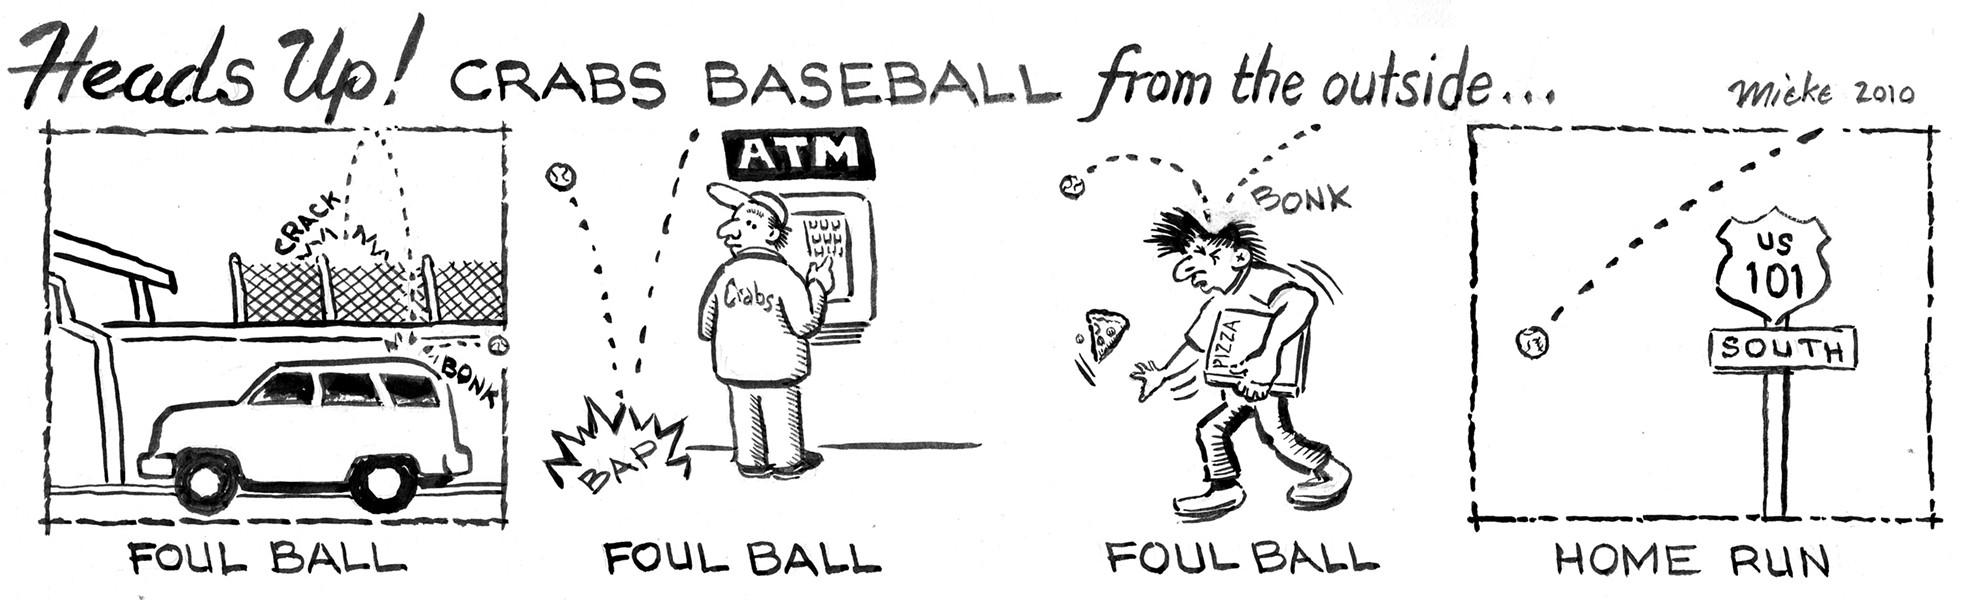 crabs-baseball.jpg